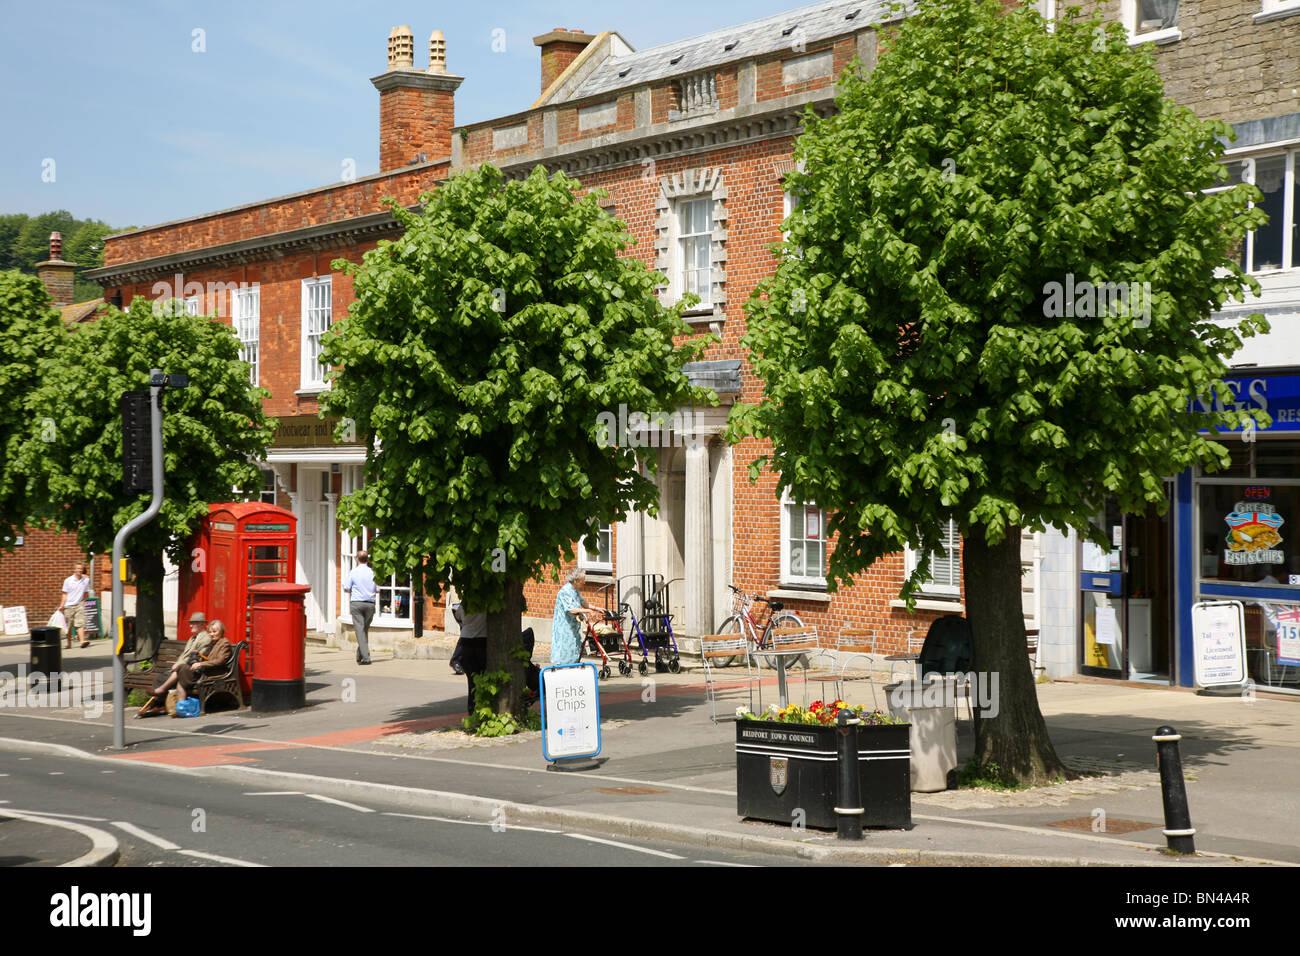 The West Dorset town of Bridport's main postoffice on West Street - Stock Image